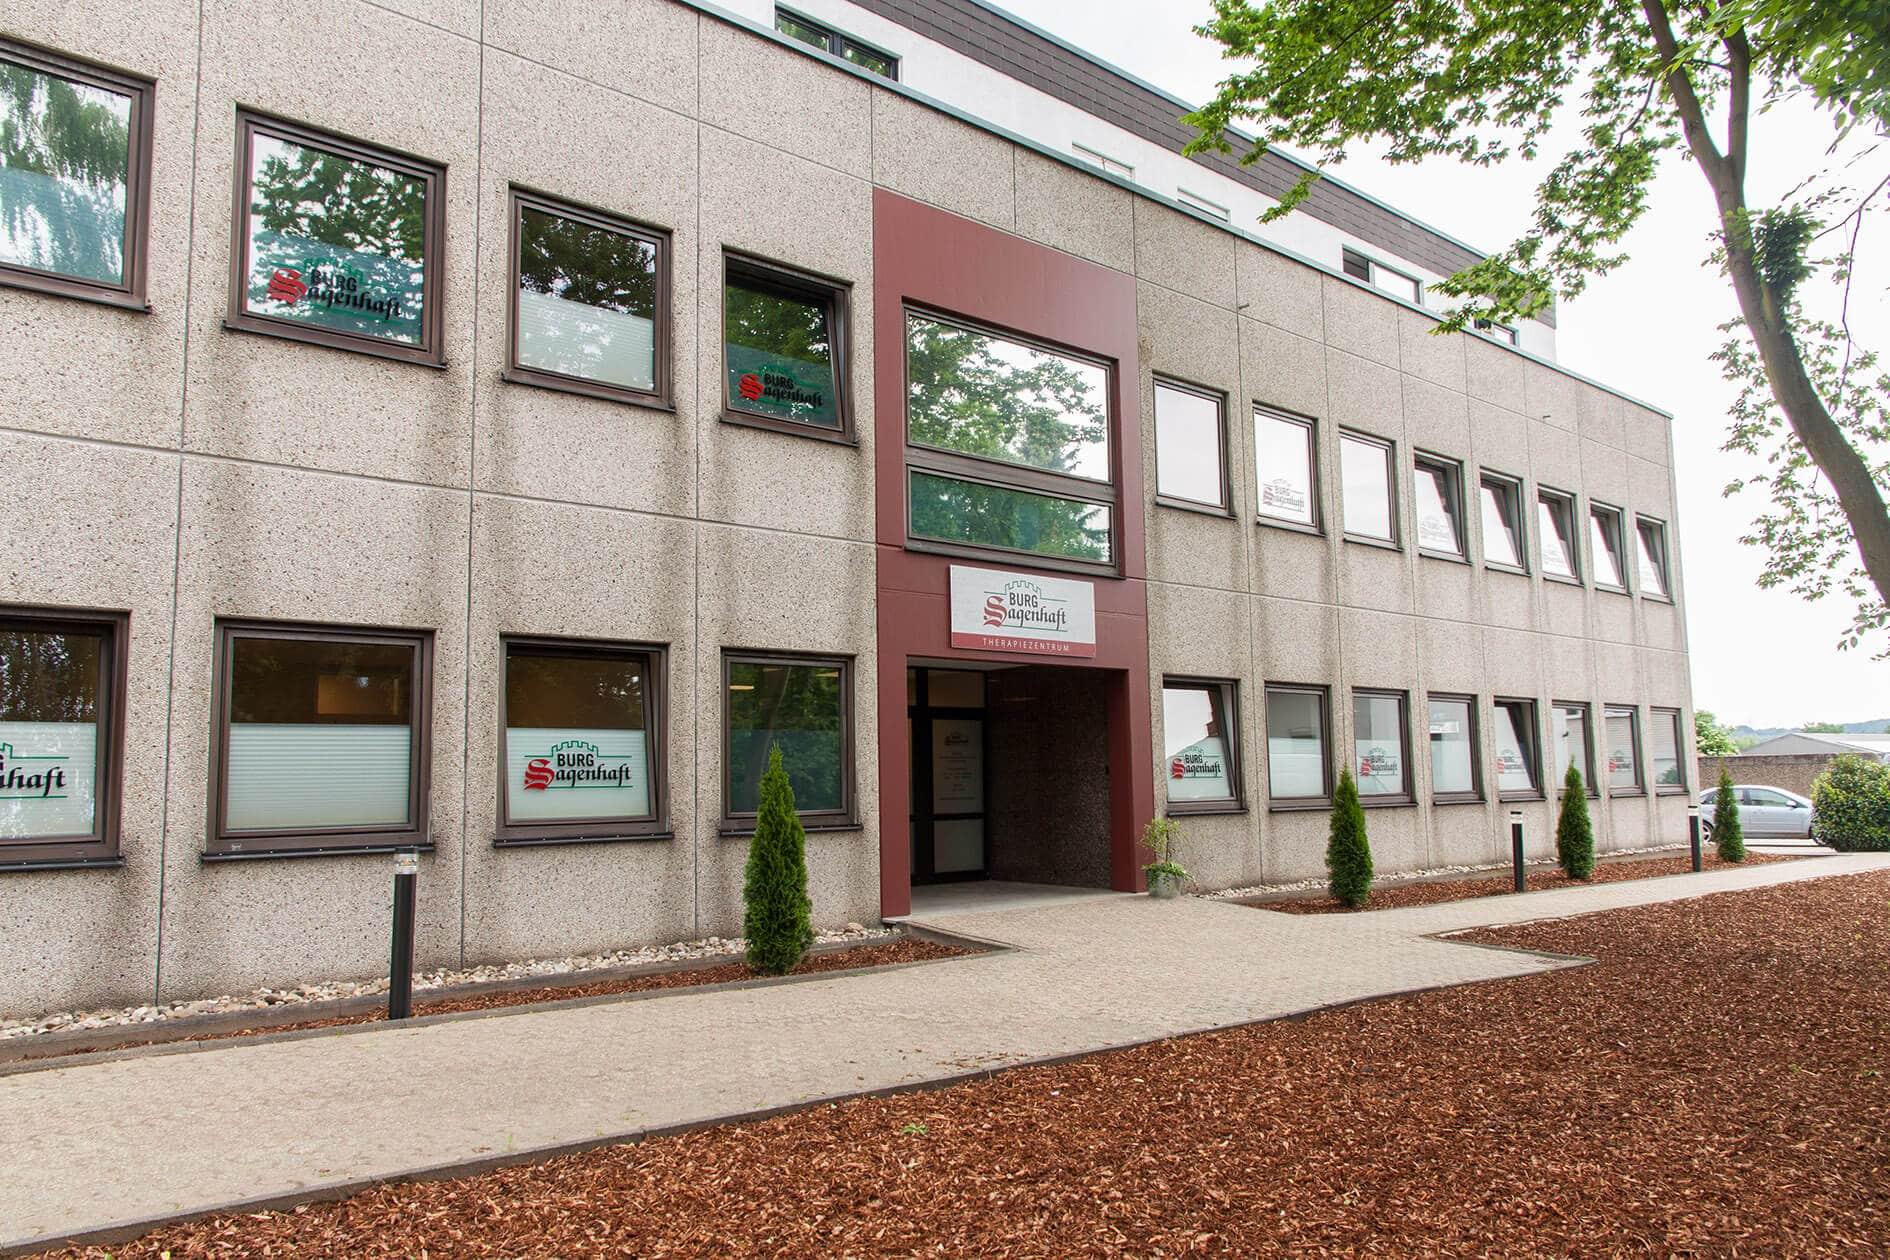 Therapiezentrum Burg Sagenhaft, Bremsen